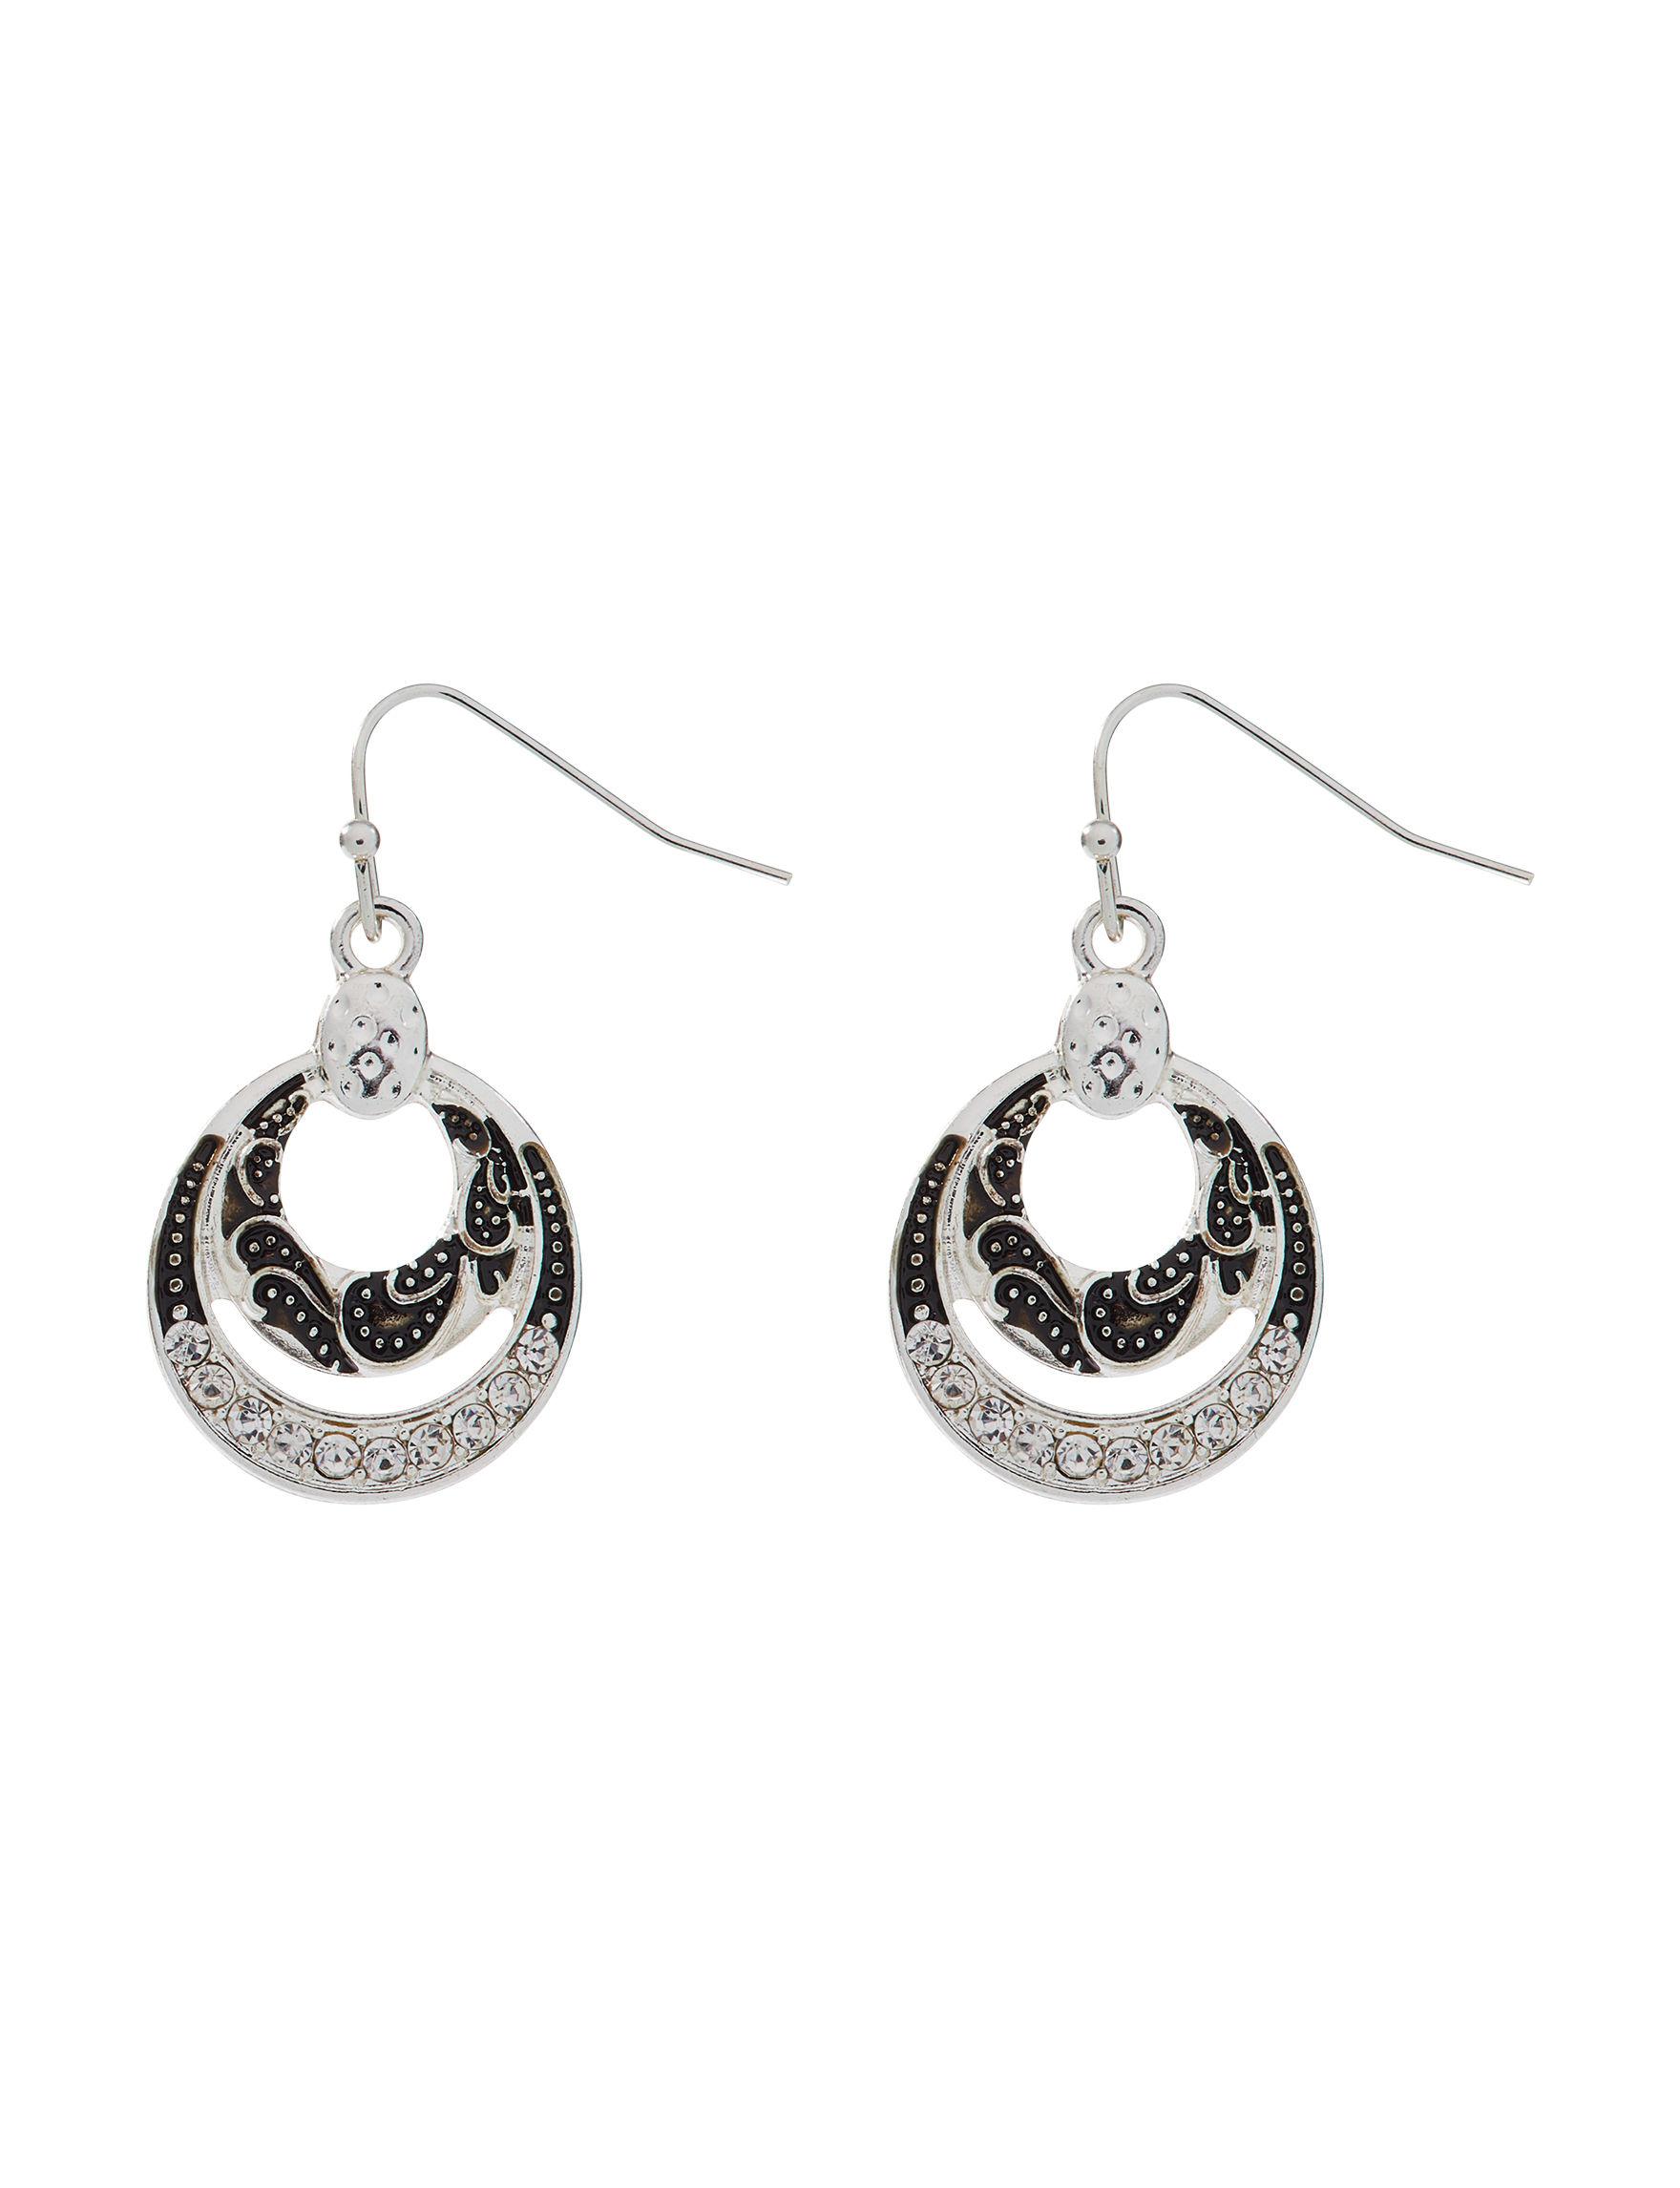 Hannah Silver / Crystal Drops Earrings Fashion Jewelry